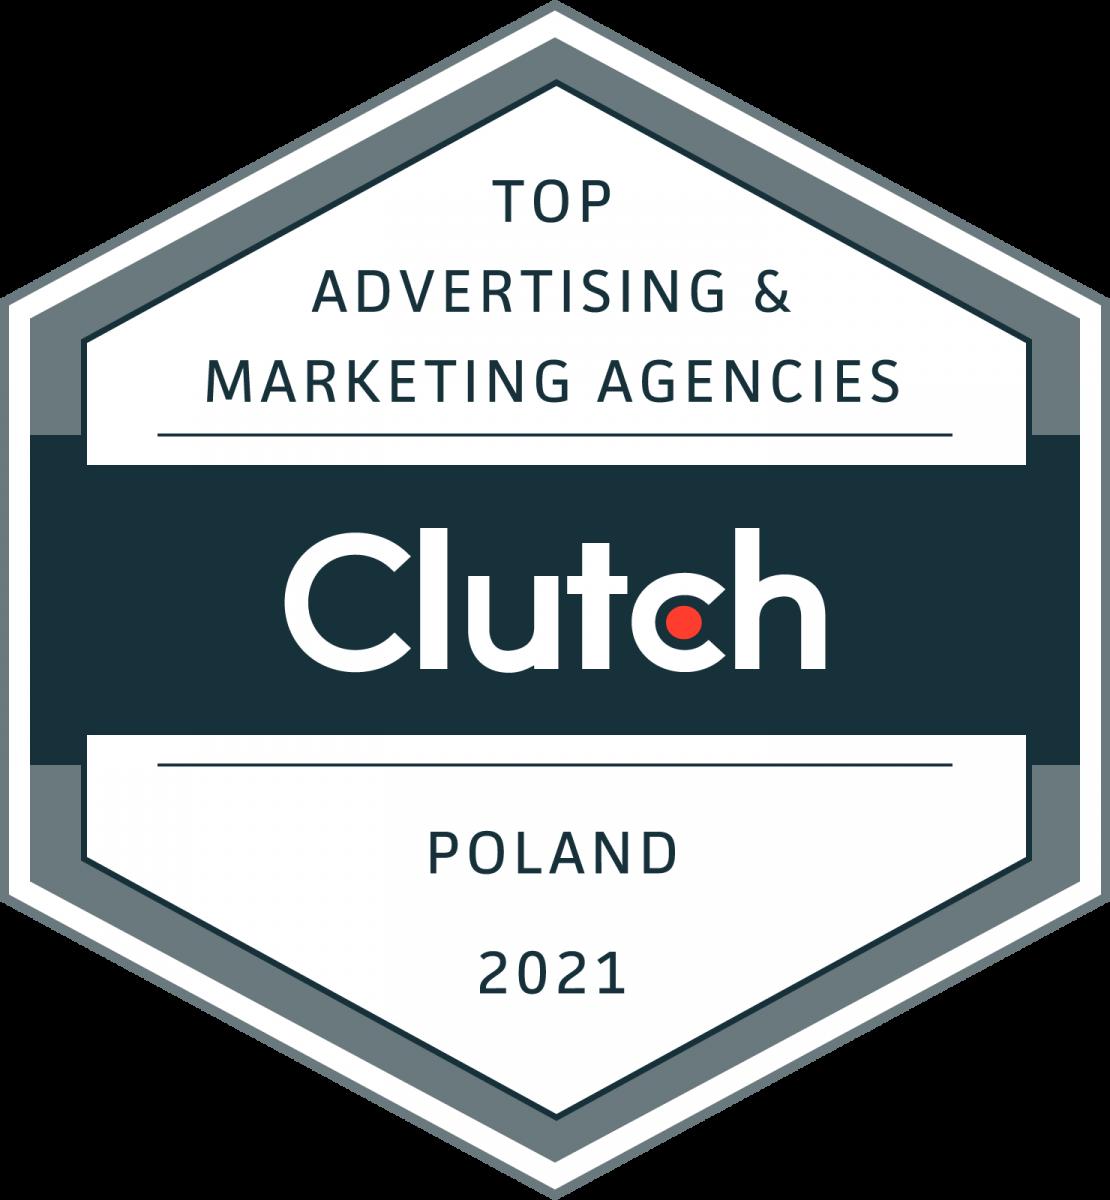 Top Advertising Marketing Firms Poland 2021